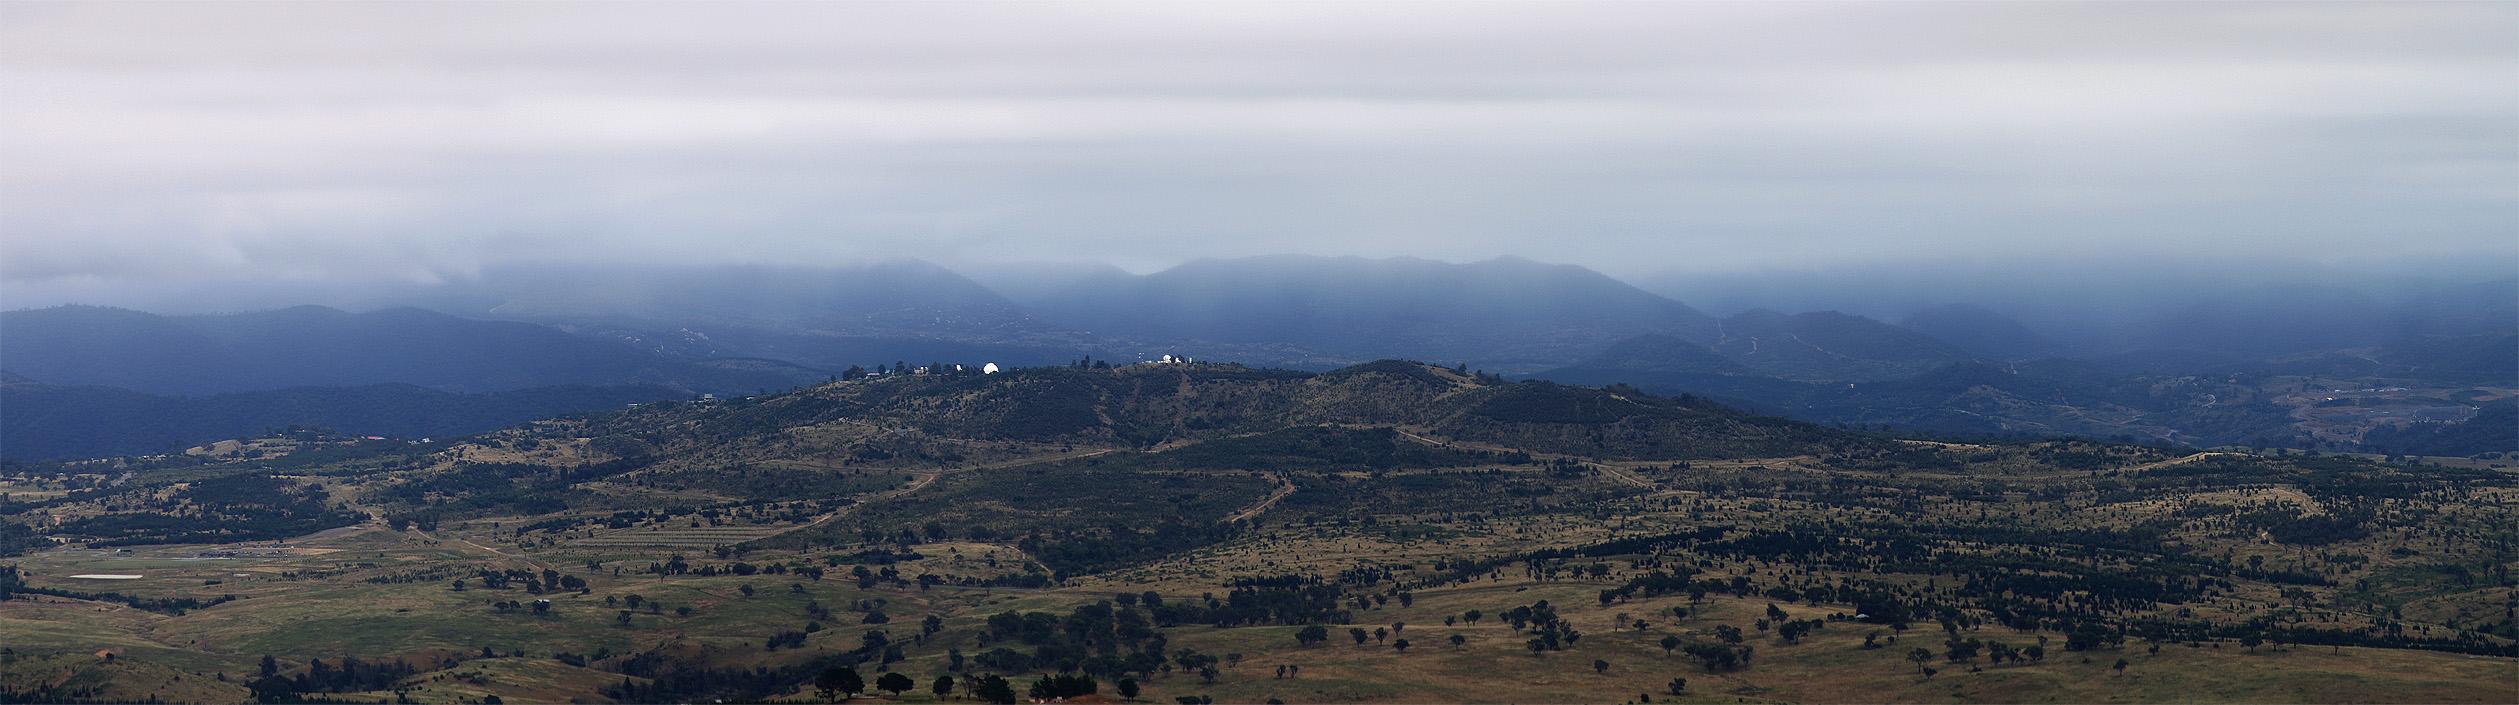 Mount Stromlo Observatory by Chrissyo